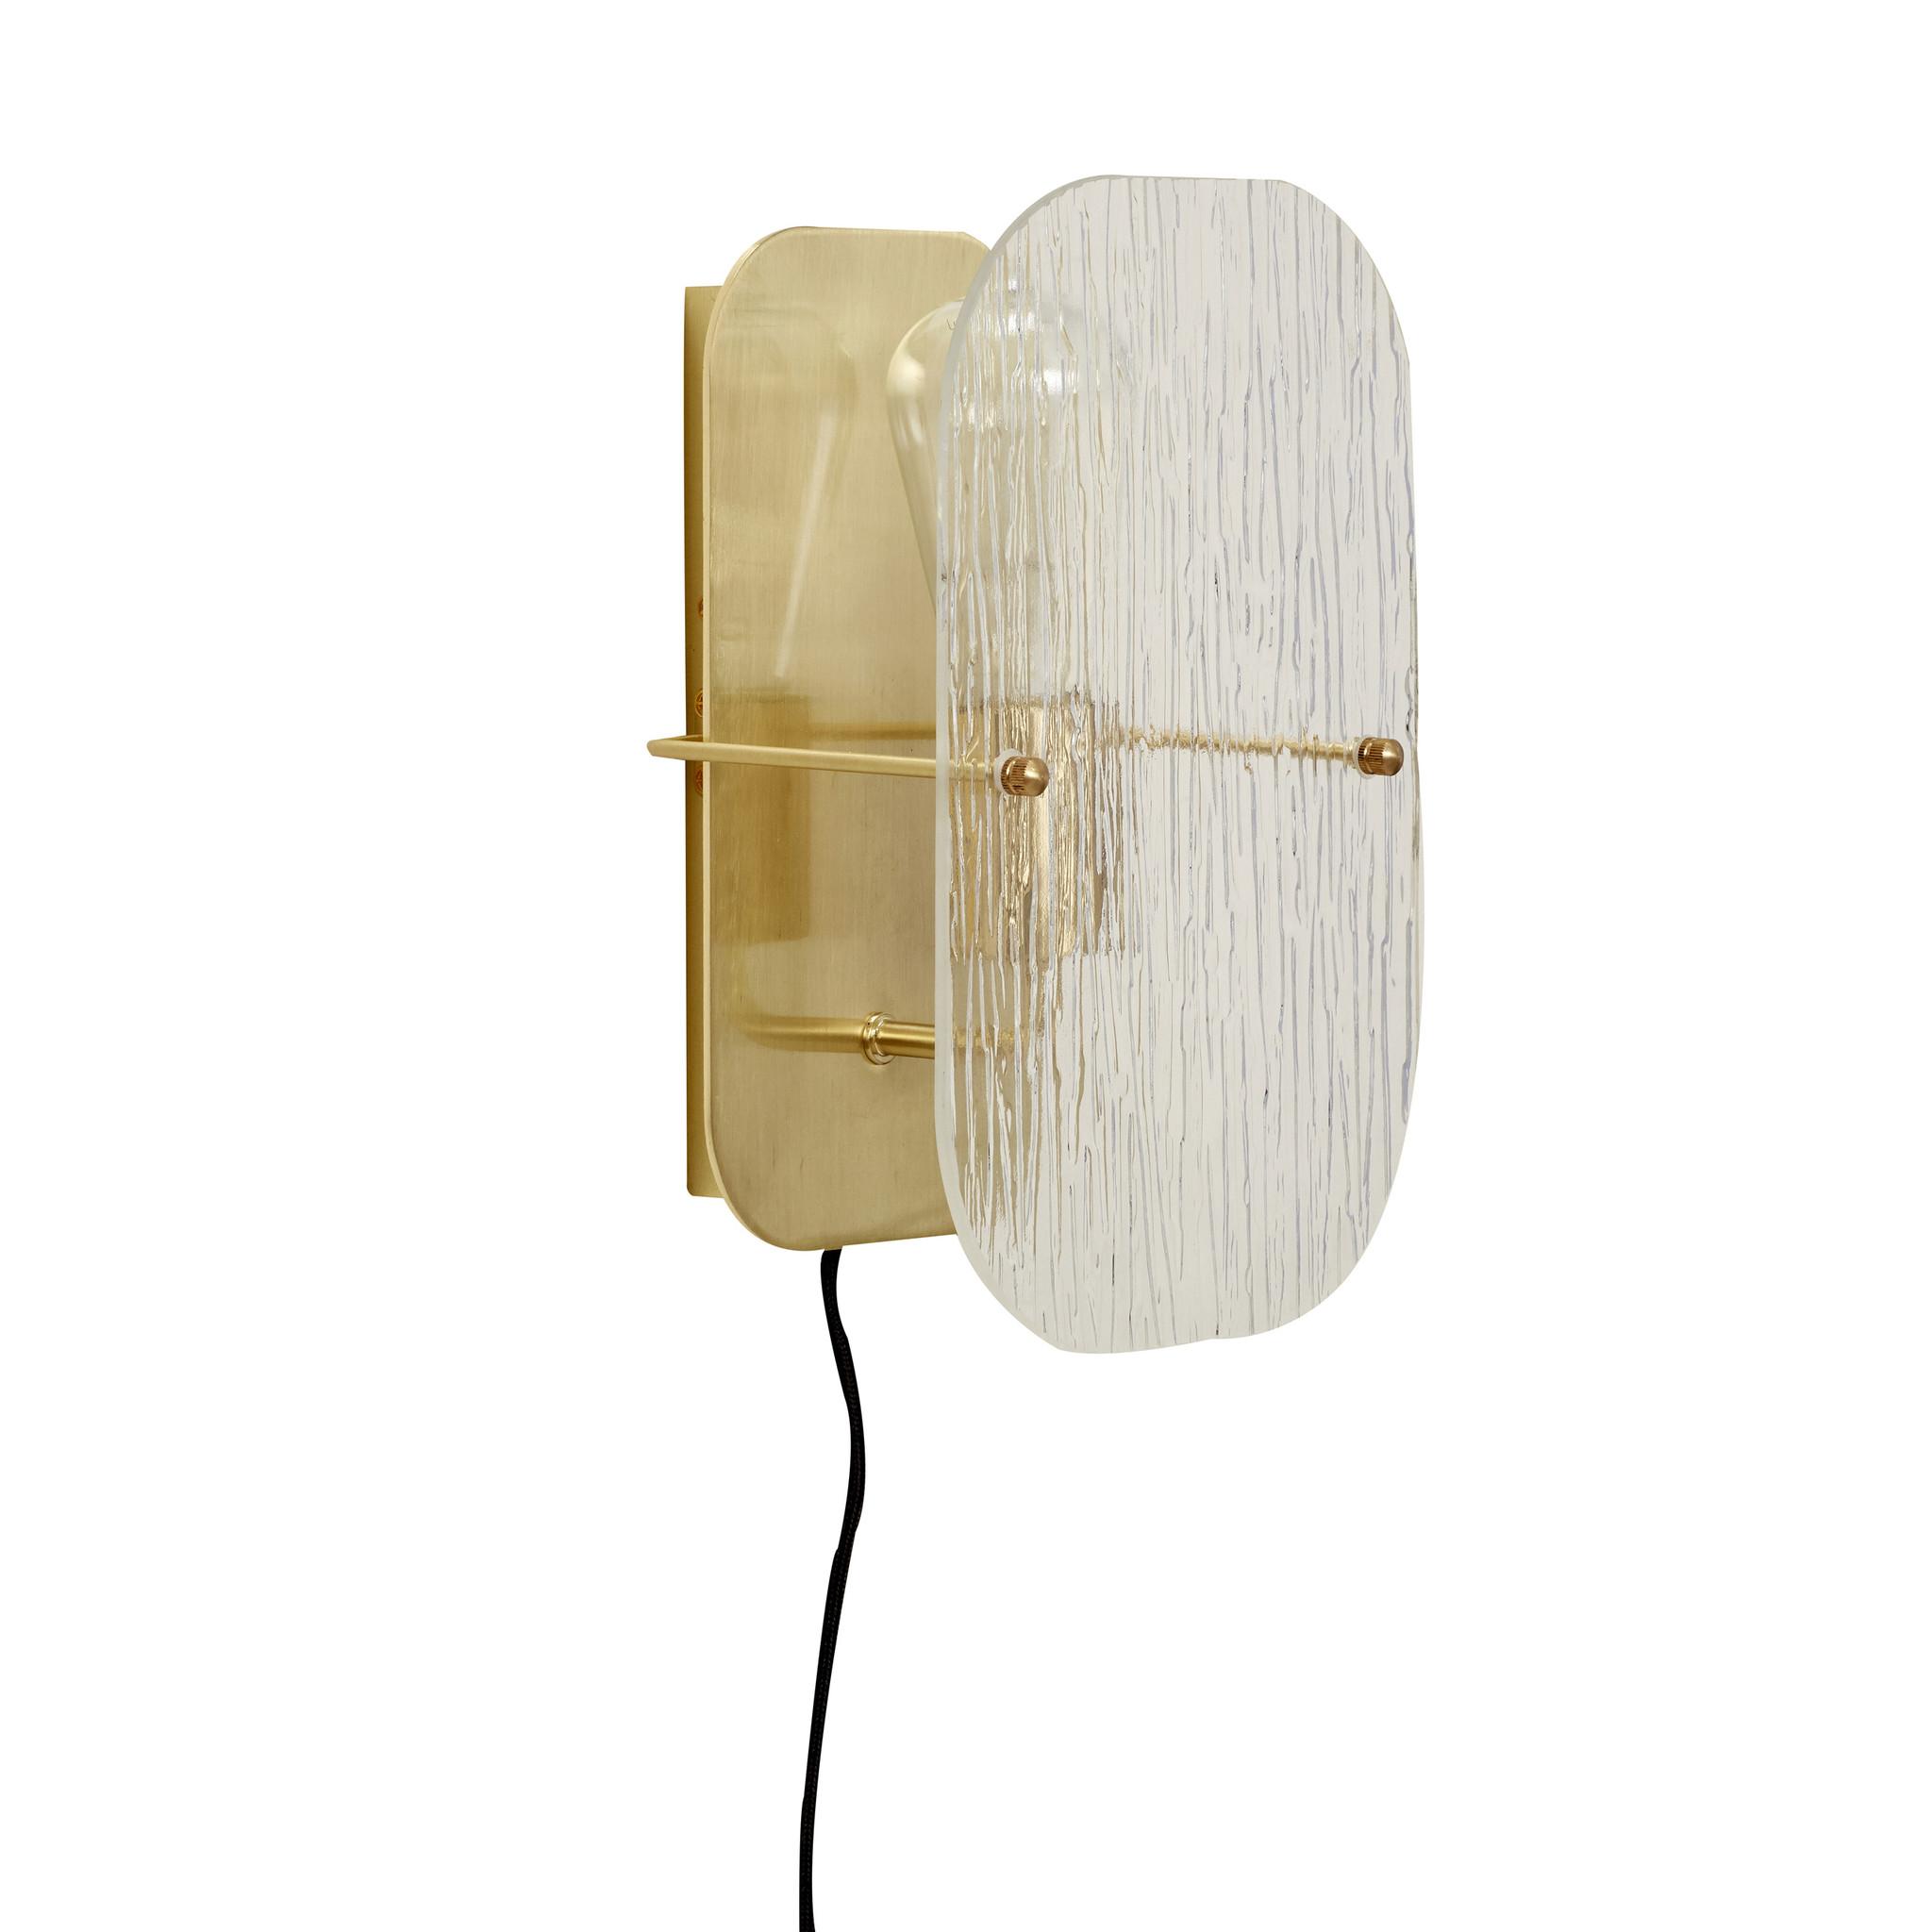 Hubsch Wandlamp metaal/glas, goud-991115-5712772072639